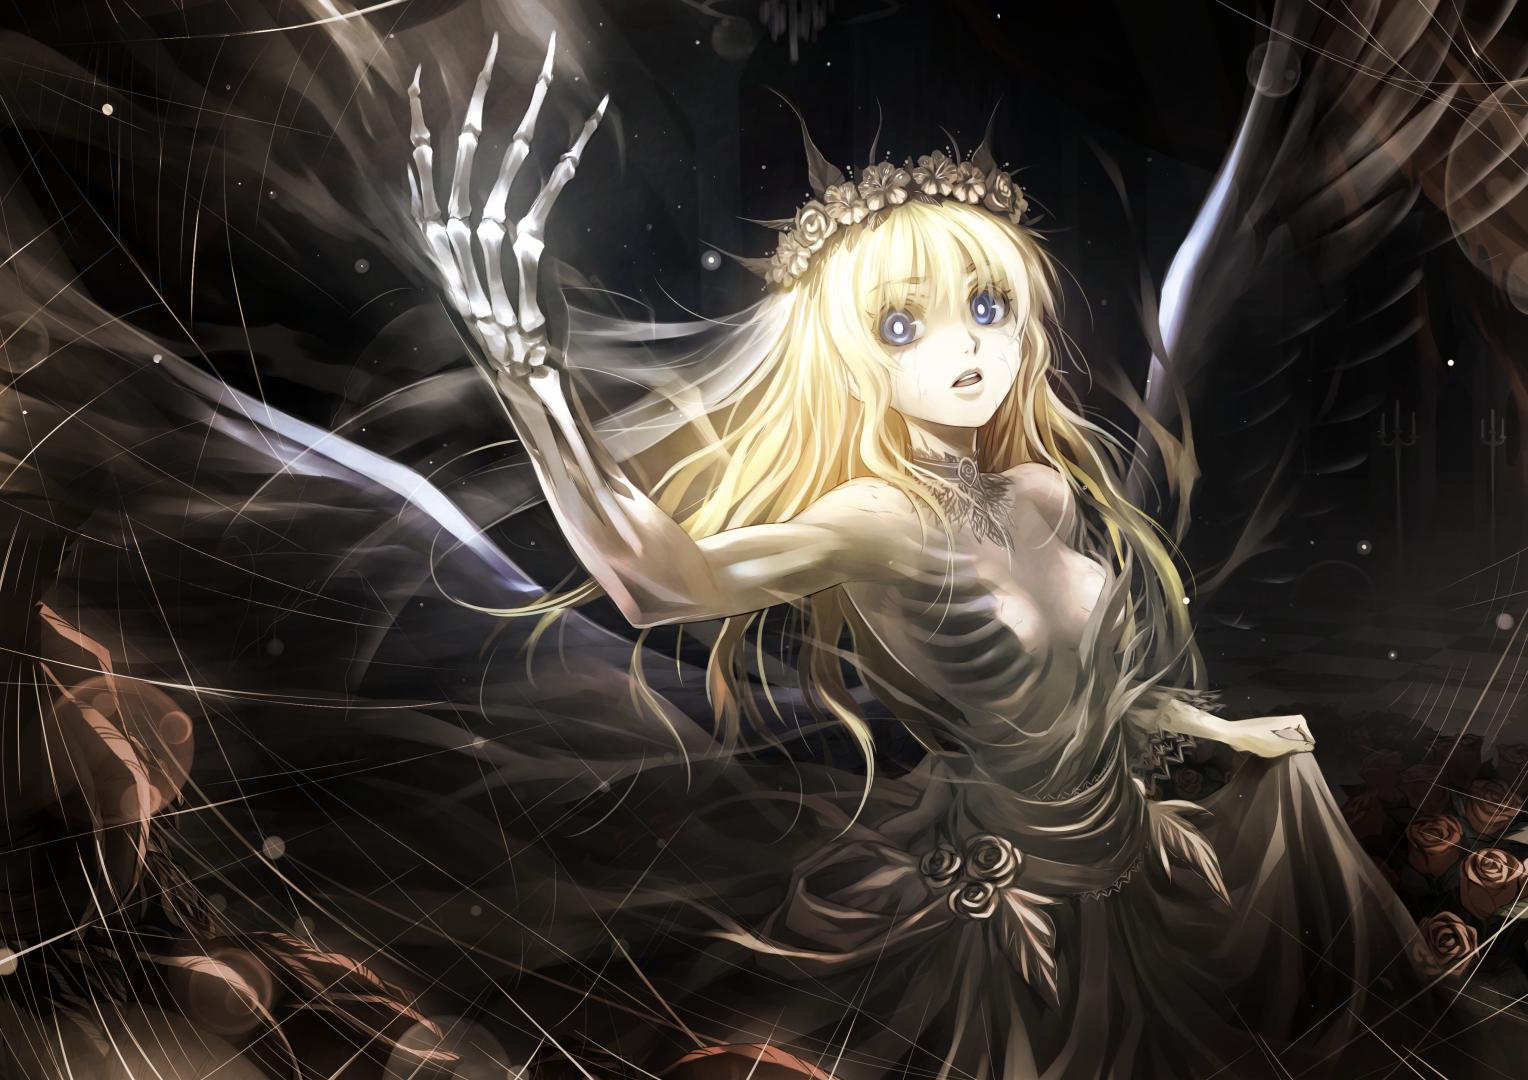 Haunting anime angel ghost girl by kriss chucks anime shrine